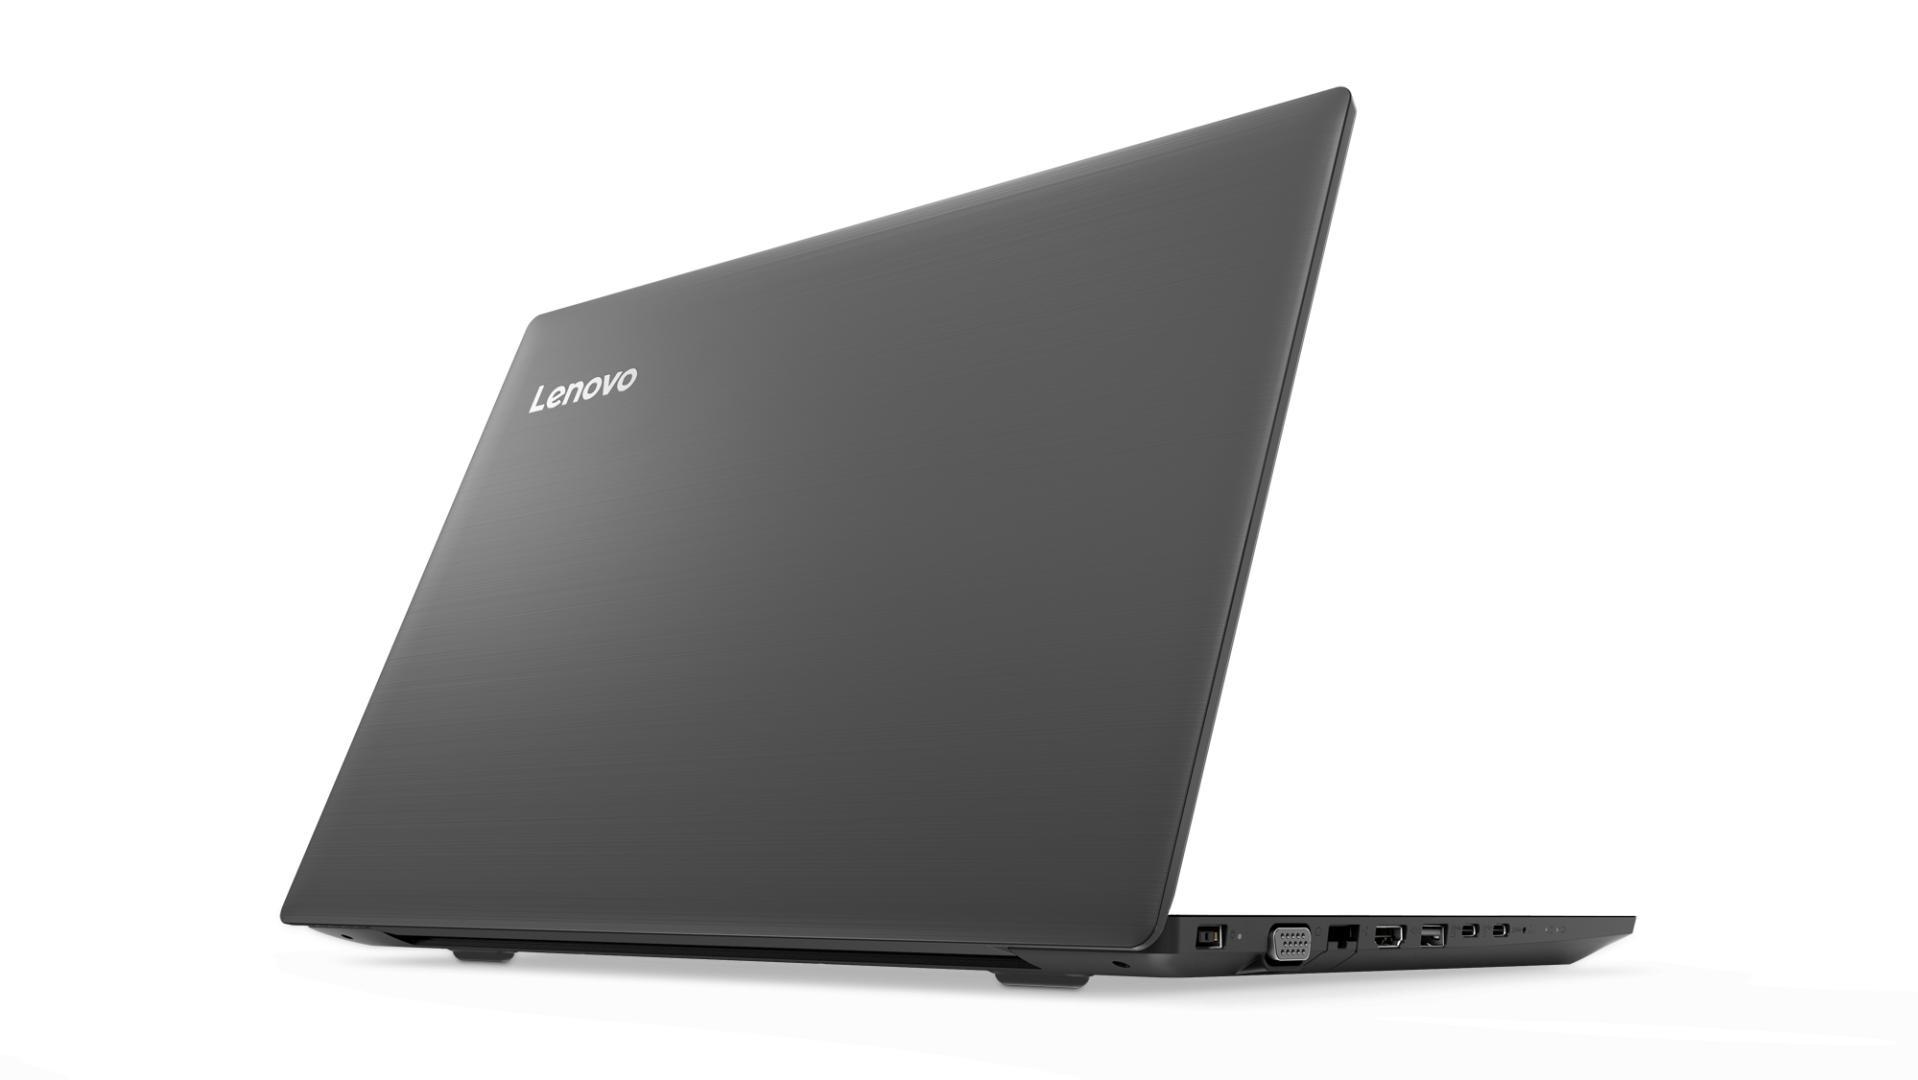 "Lenovo V330-15IKB 15.6"" FHD, Intel Core I5-8250U, AMD R17M-M1-70 GDDR5 2G"